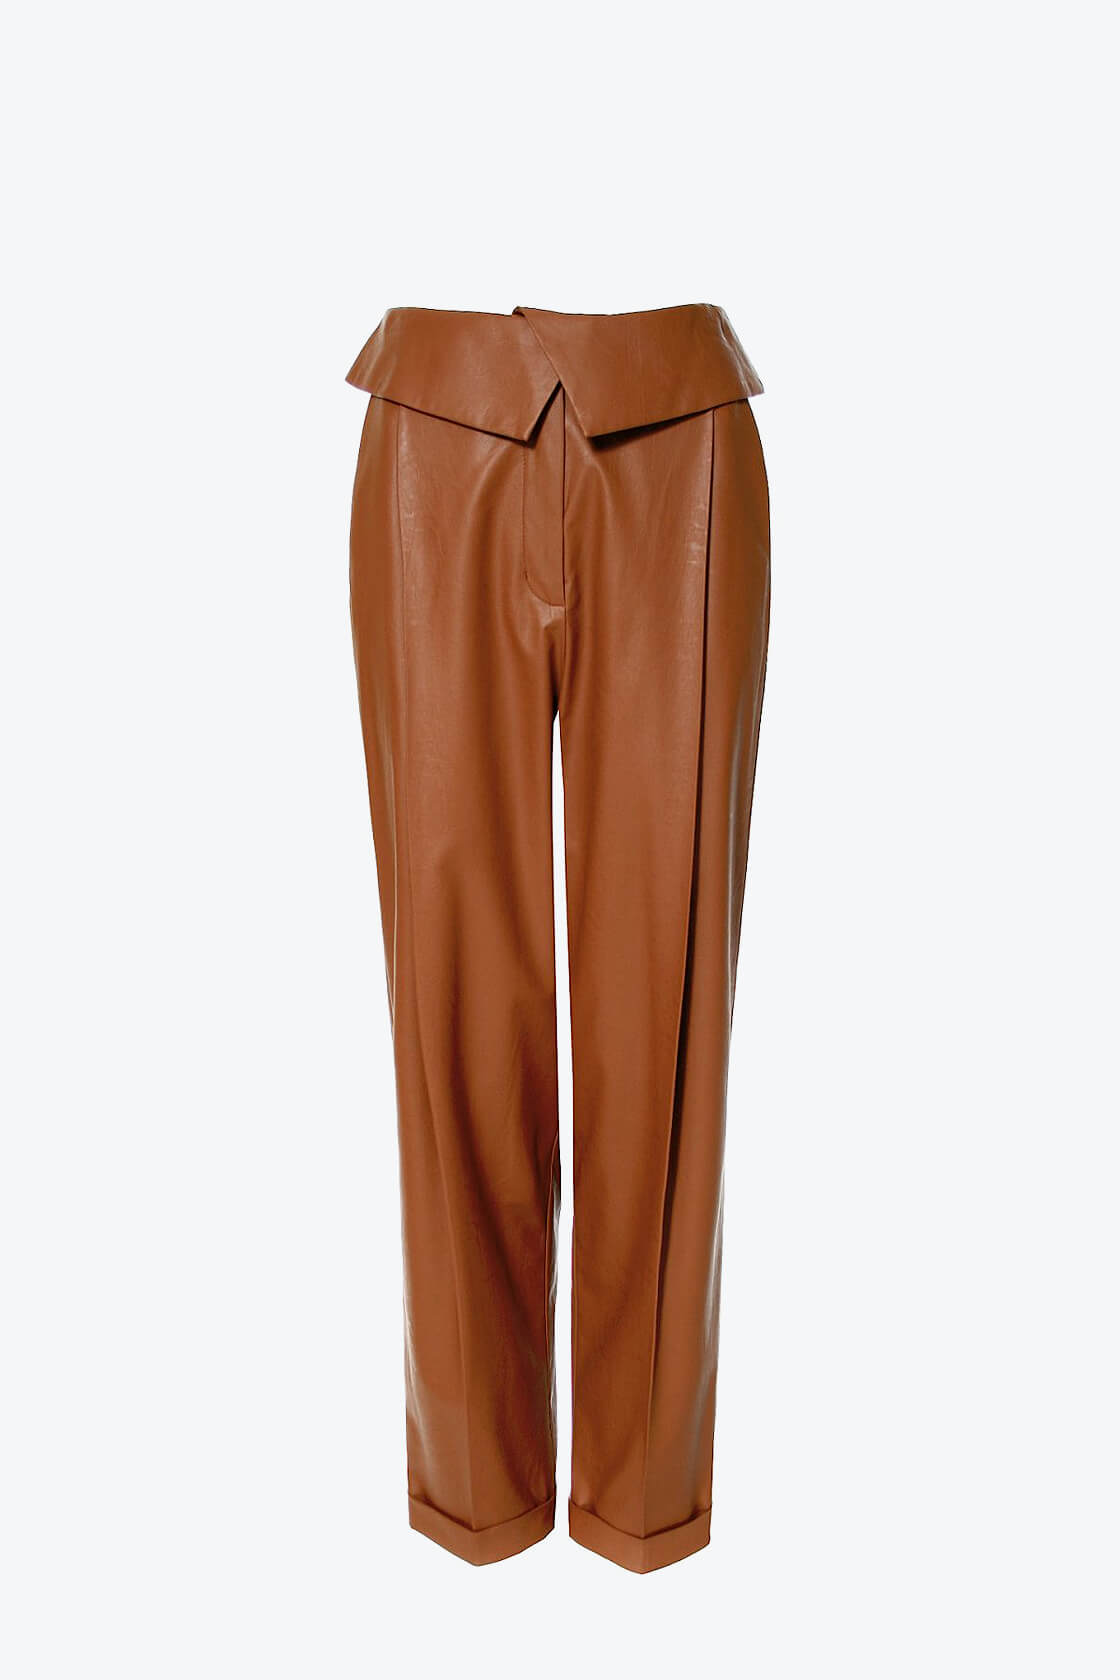 OL100002598 Pants Xenia Raw Umber1B 1